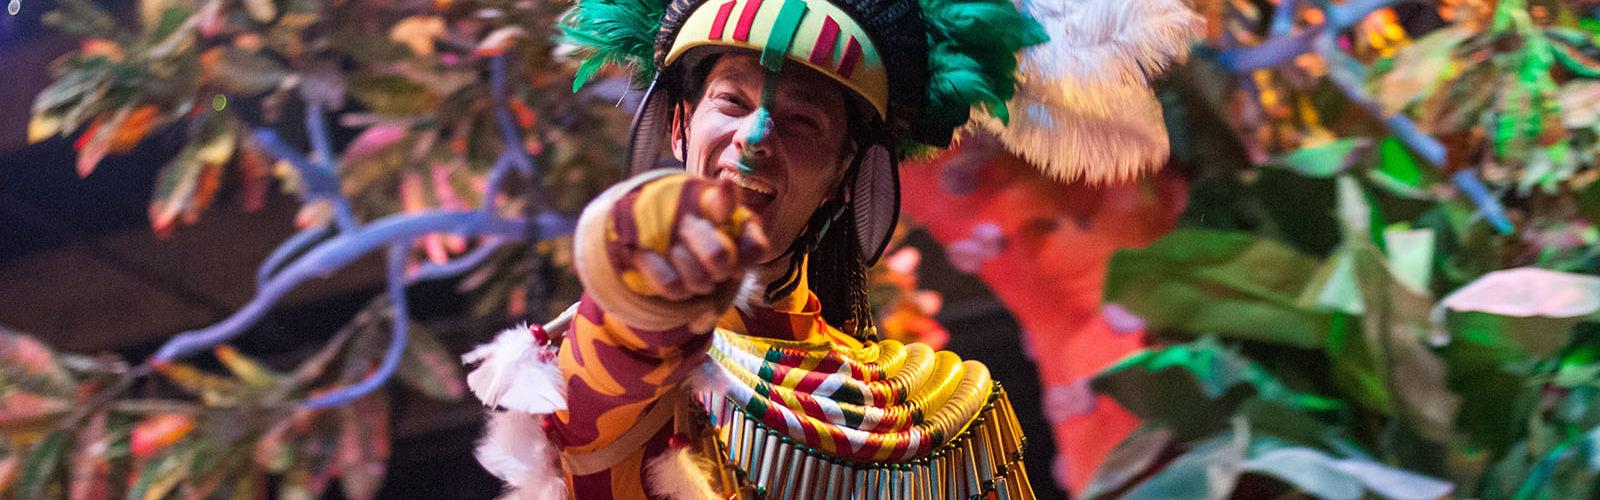 miami-carnaval-article